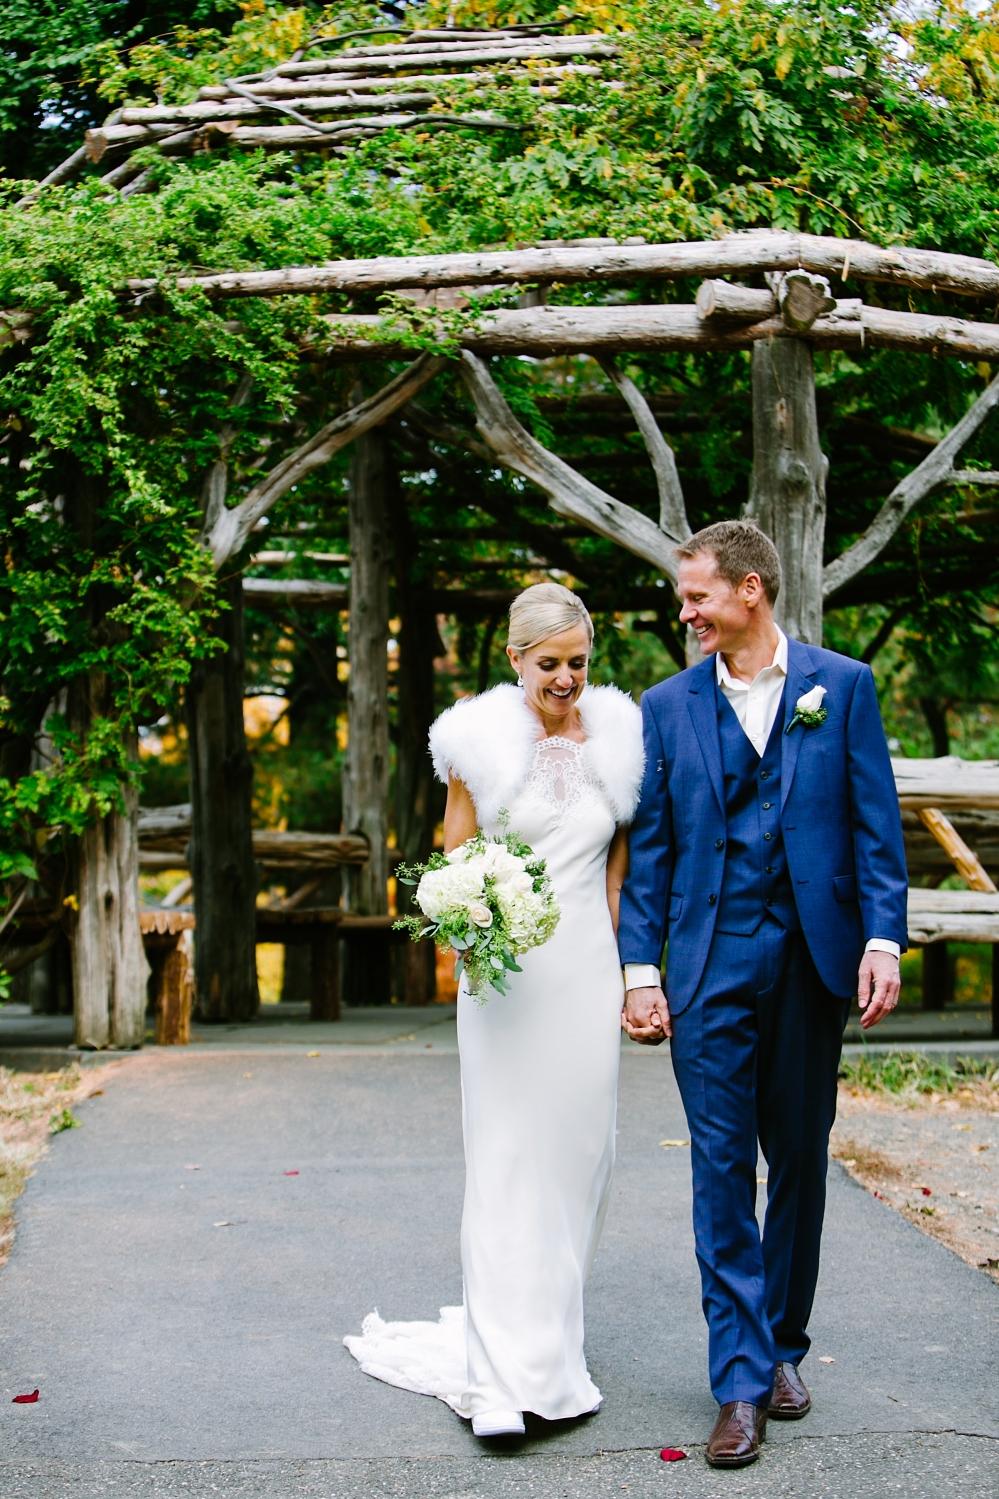 Copcot_centralpark_wedding_TS-248